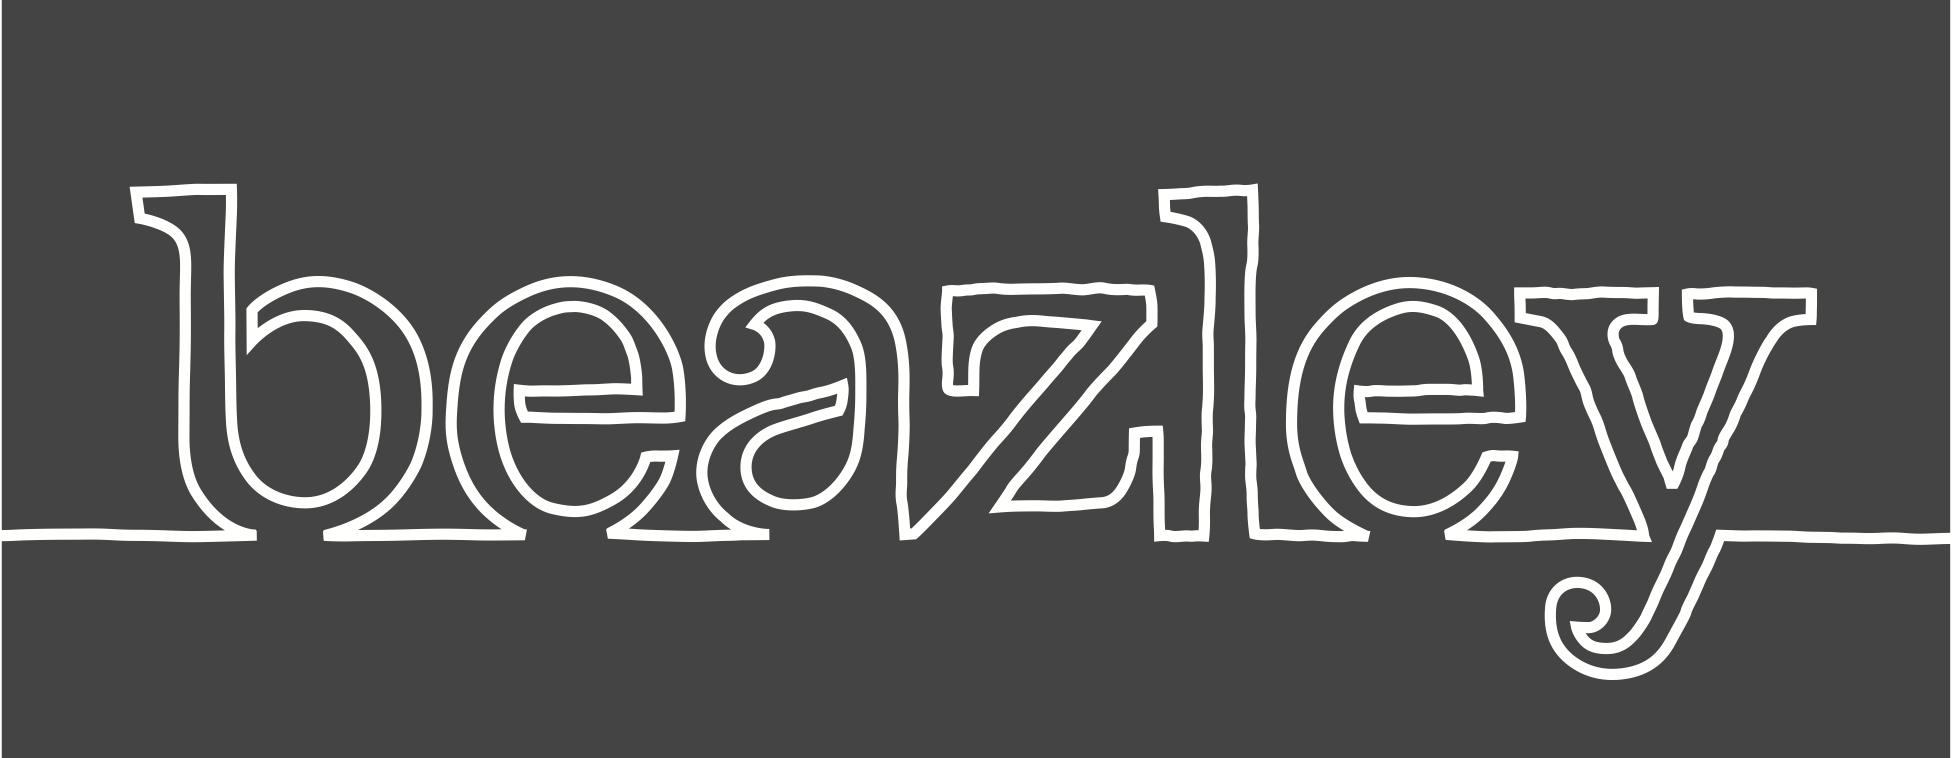 Beazley